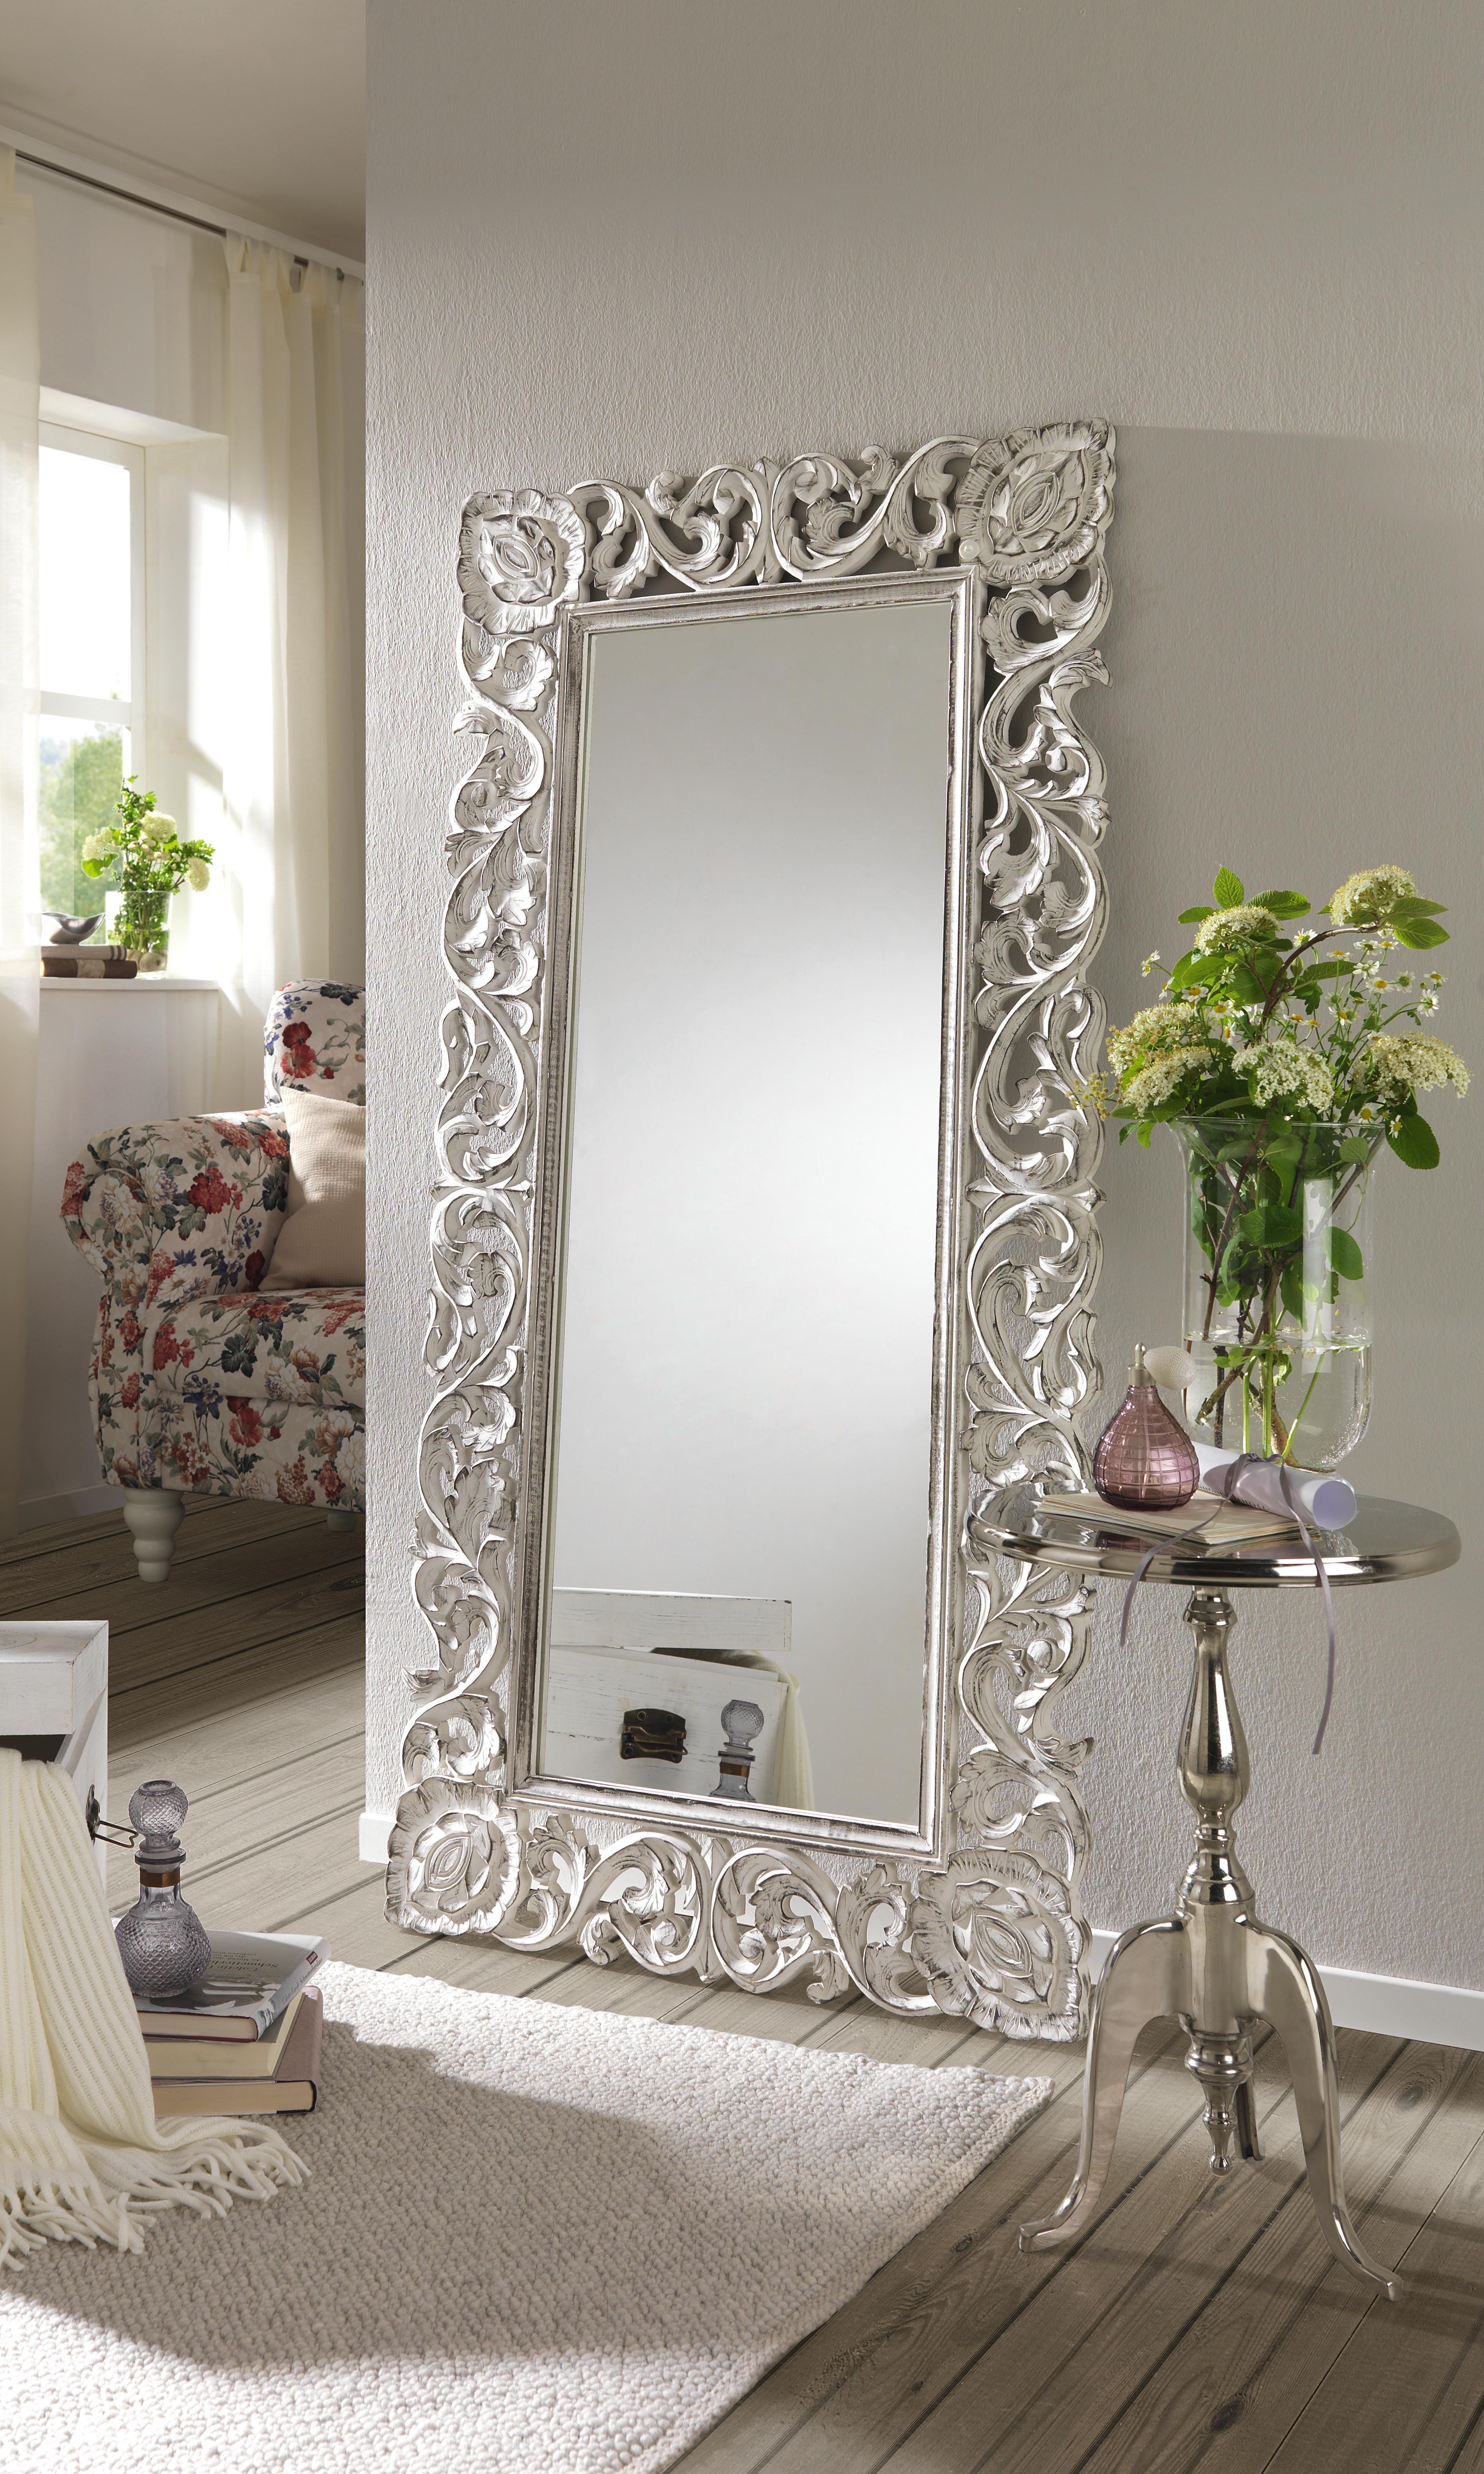 14 Captivating Modern Wall Mirror Master Bedrooms Ideas Mirror Wall Living Room Mirror Wall Bedroom Mirror Design Wall